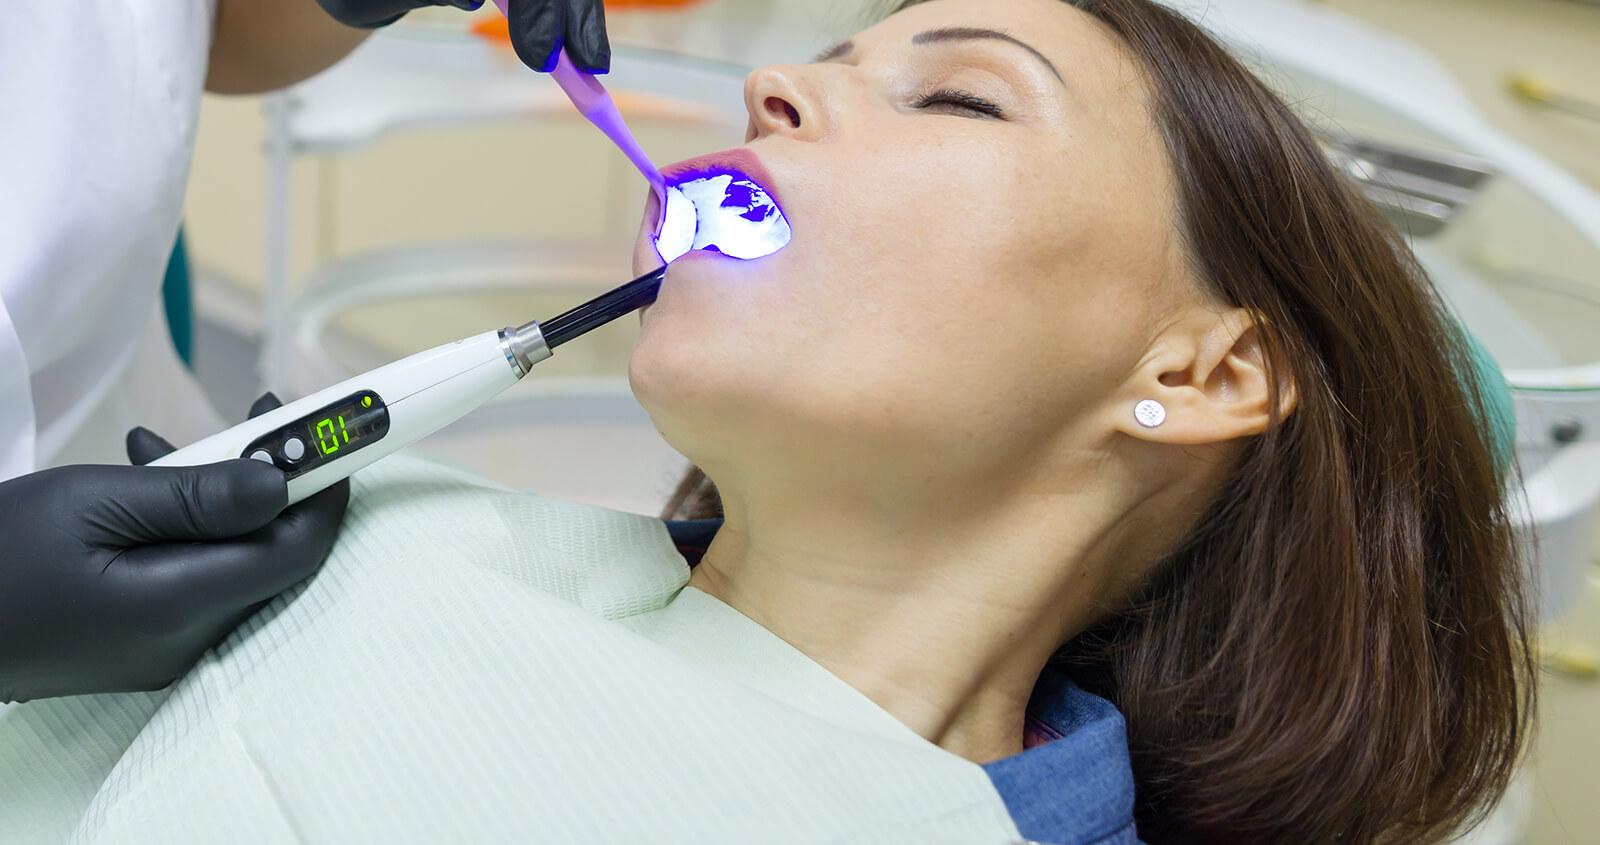 Conscious Sedation Dentist in Overland Park KS: Dental Sedation Options